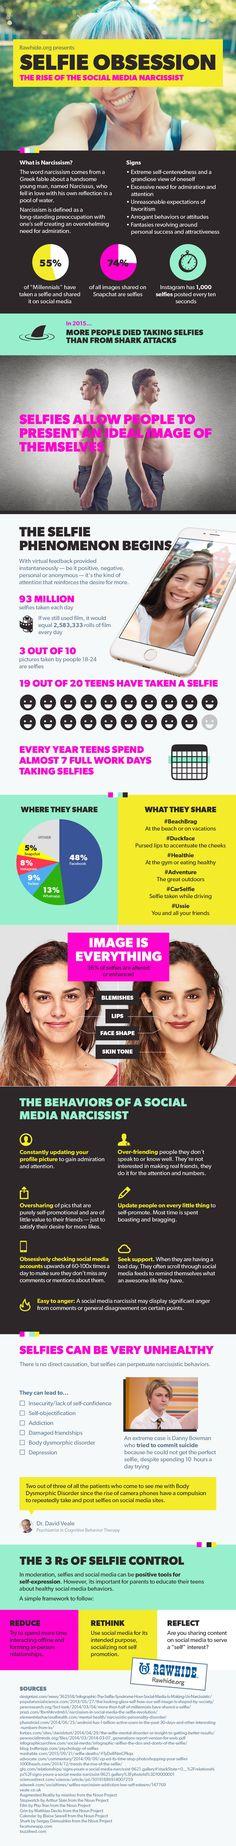 The Rise of the Social Media Narcissist #infographic #SocialMedia